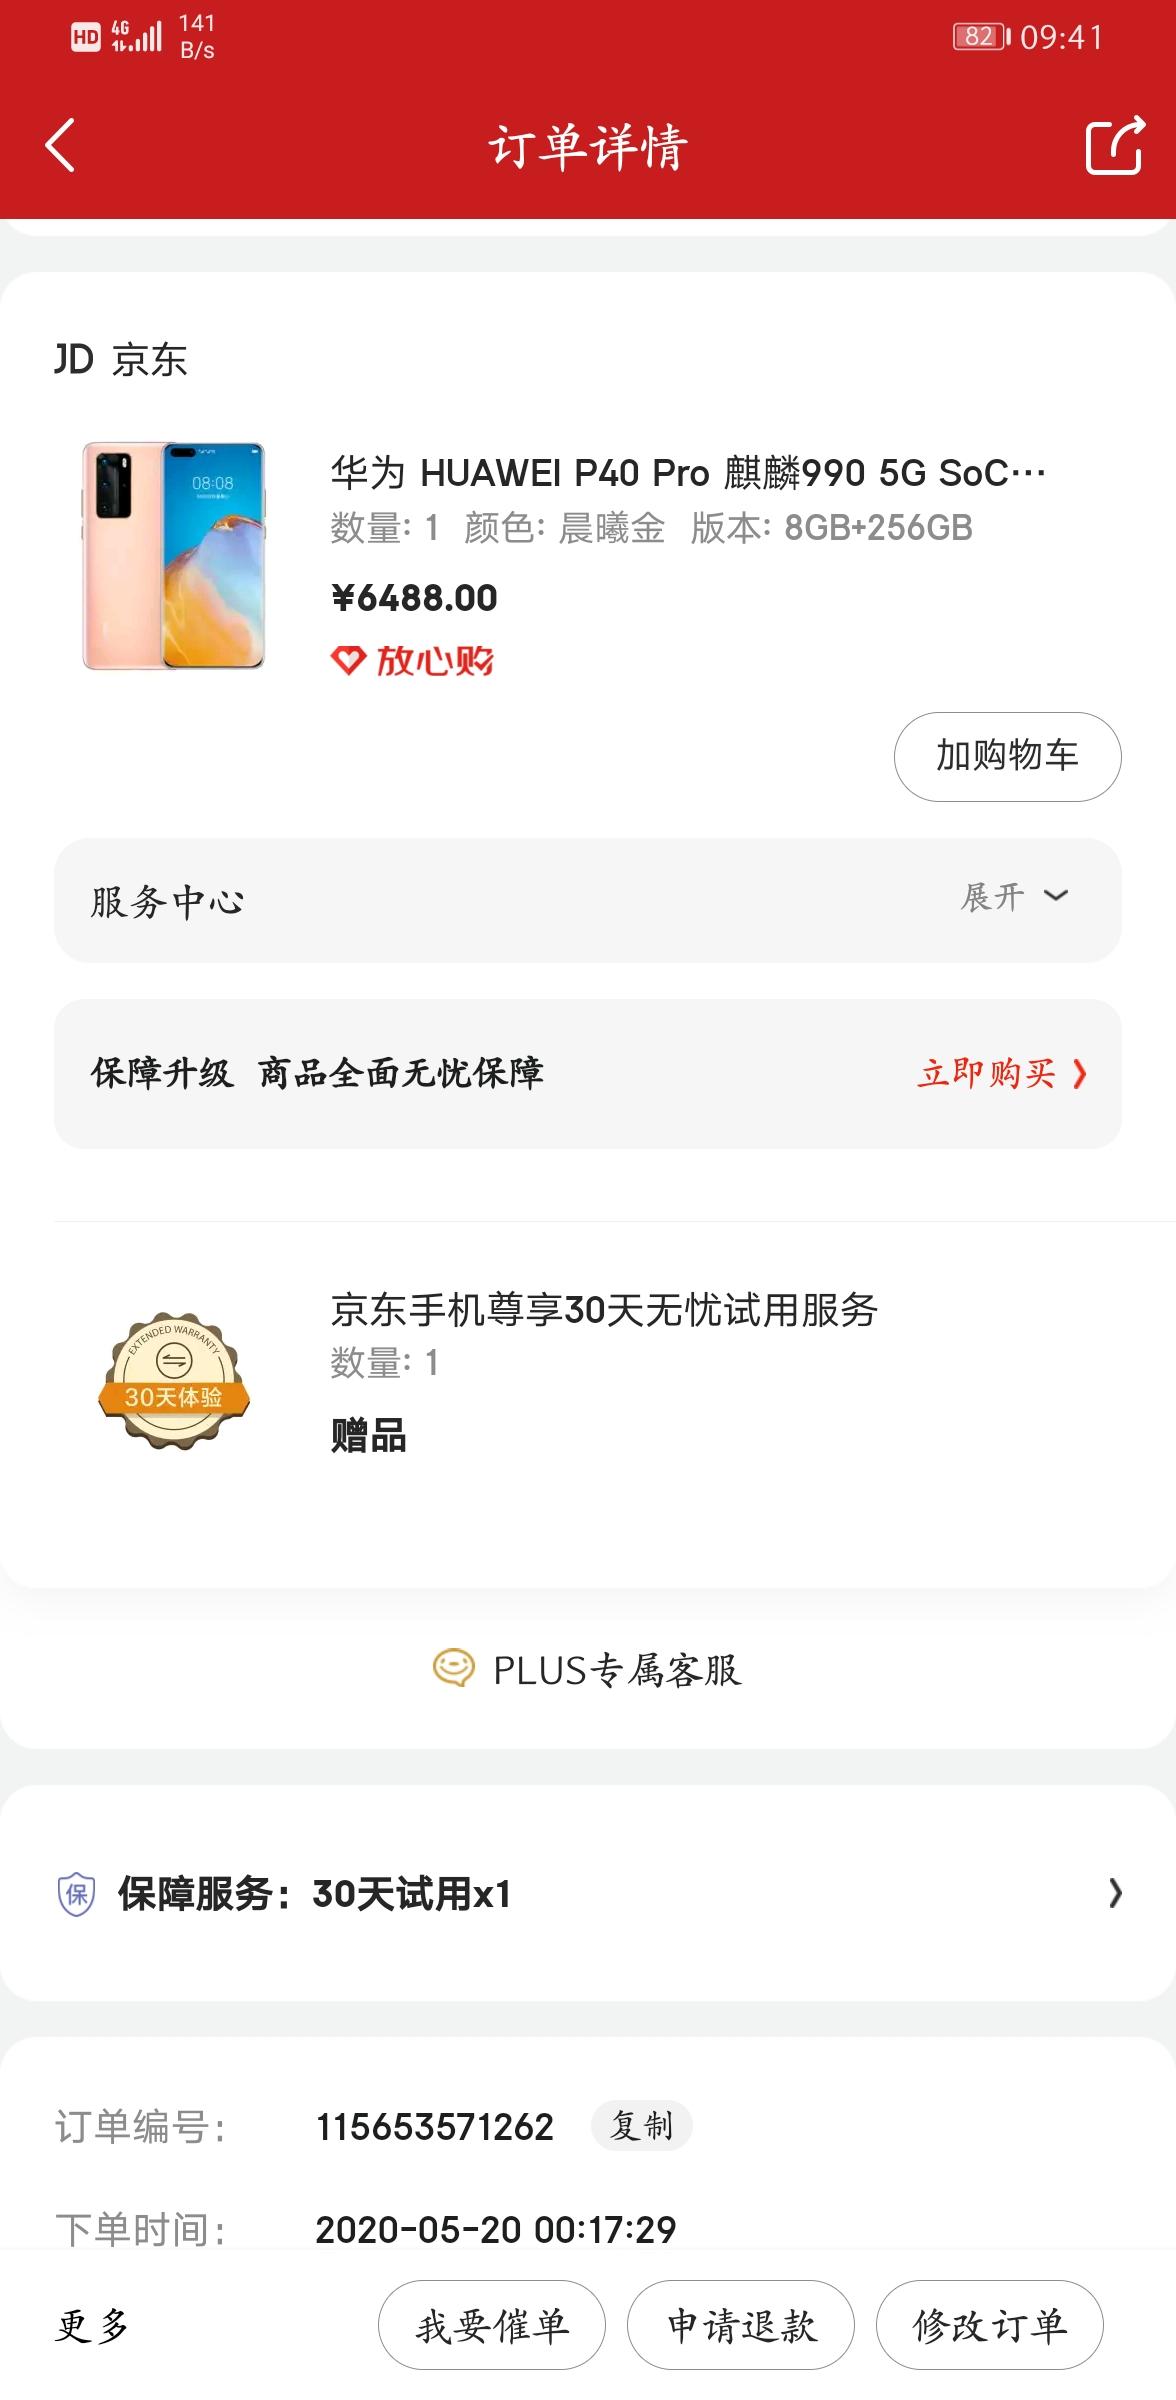 Screenshot_20200520_094139_com.jingdong.app.mall.jpg